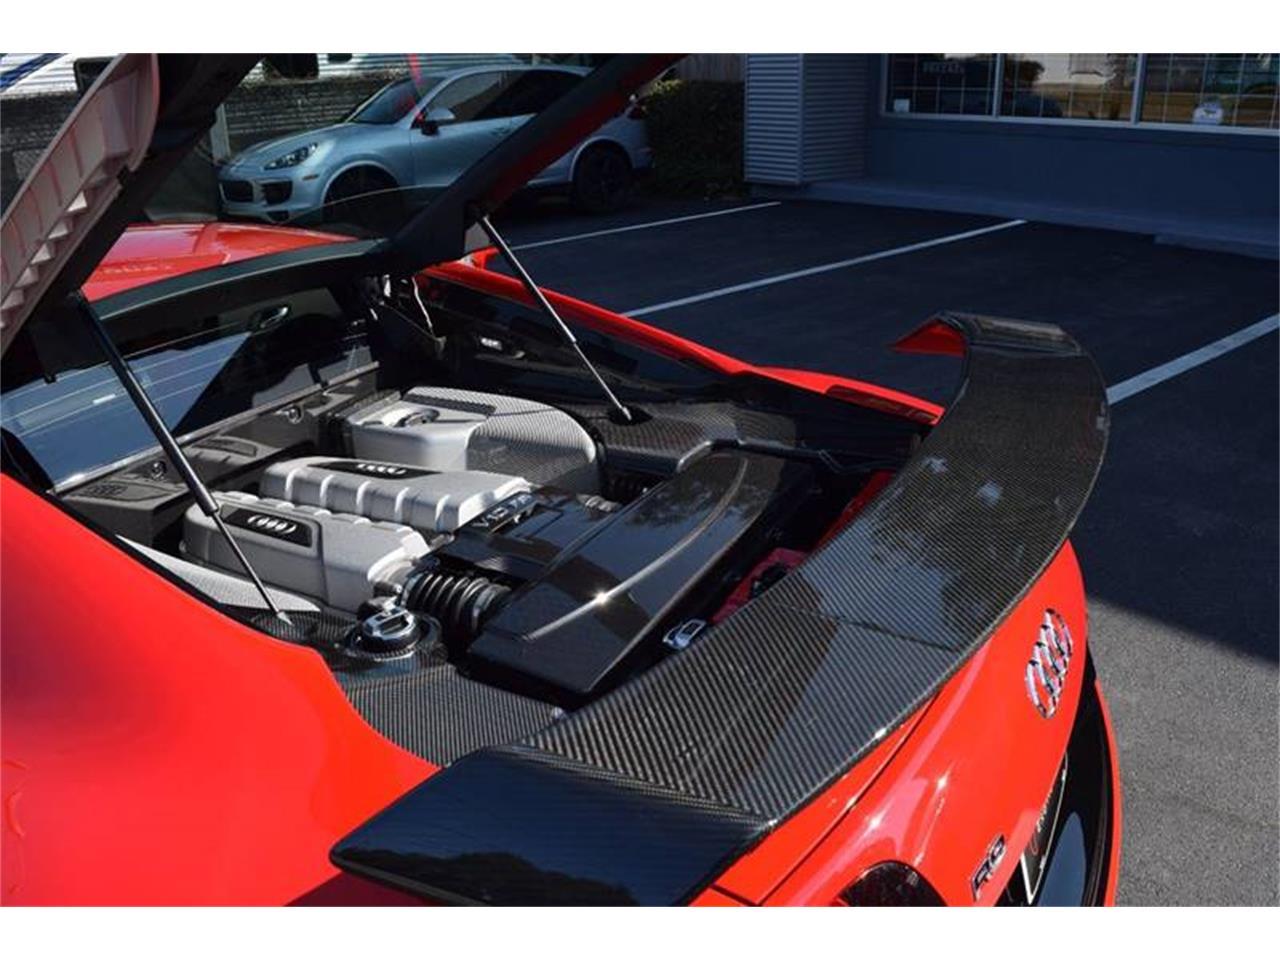 2012 Audi R8 (CC-1297435) for sale in Biloxi, Mississippi